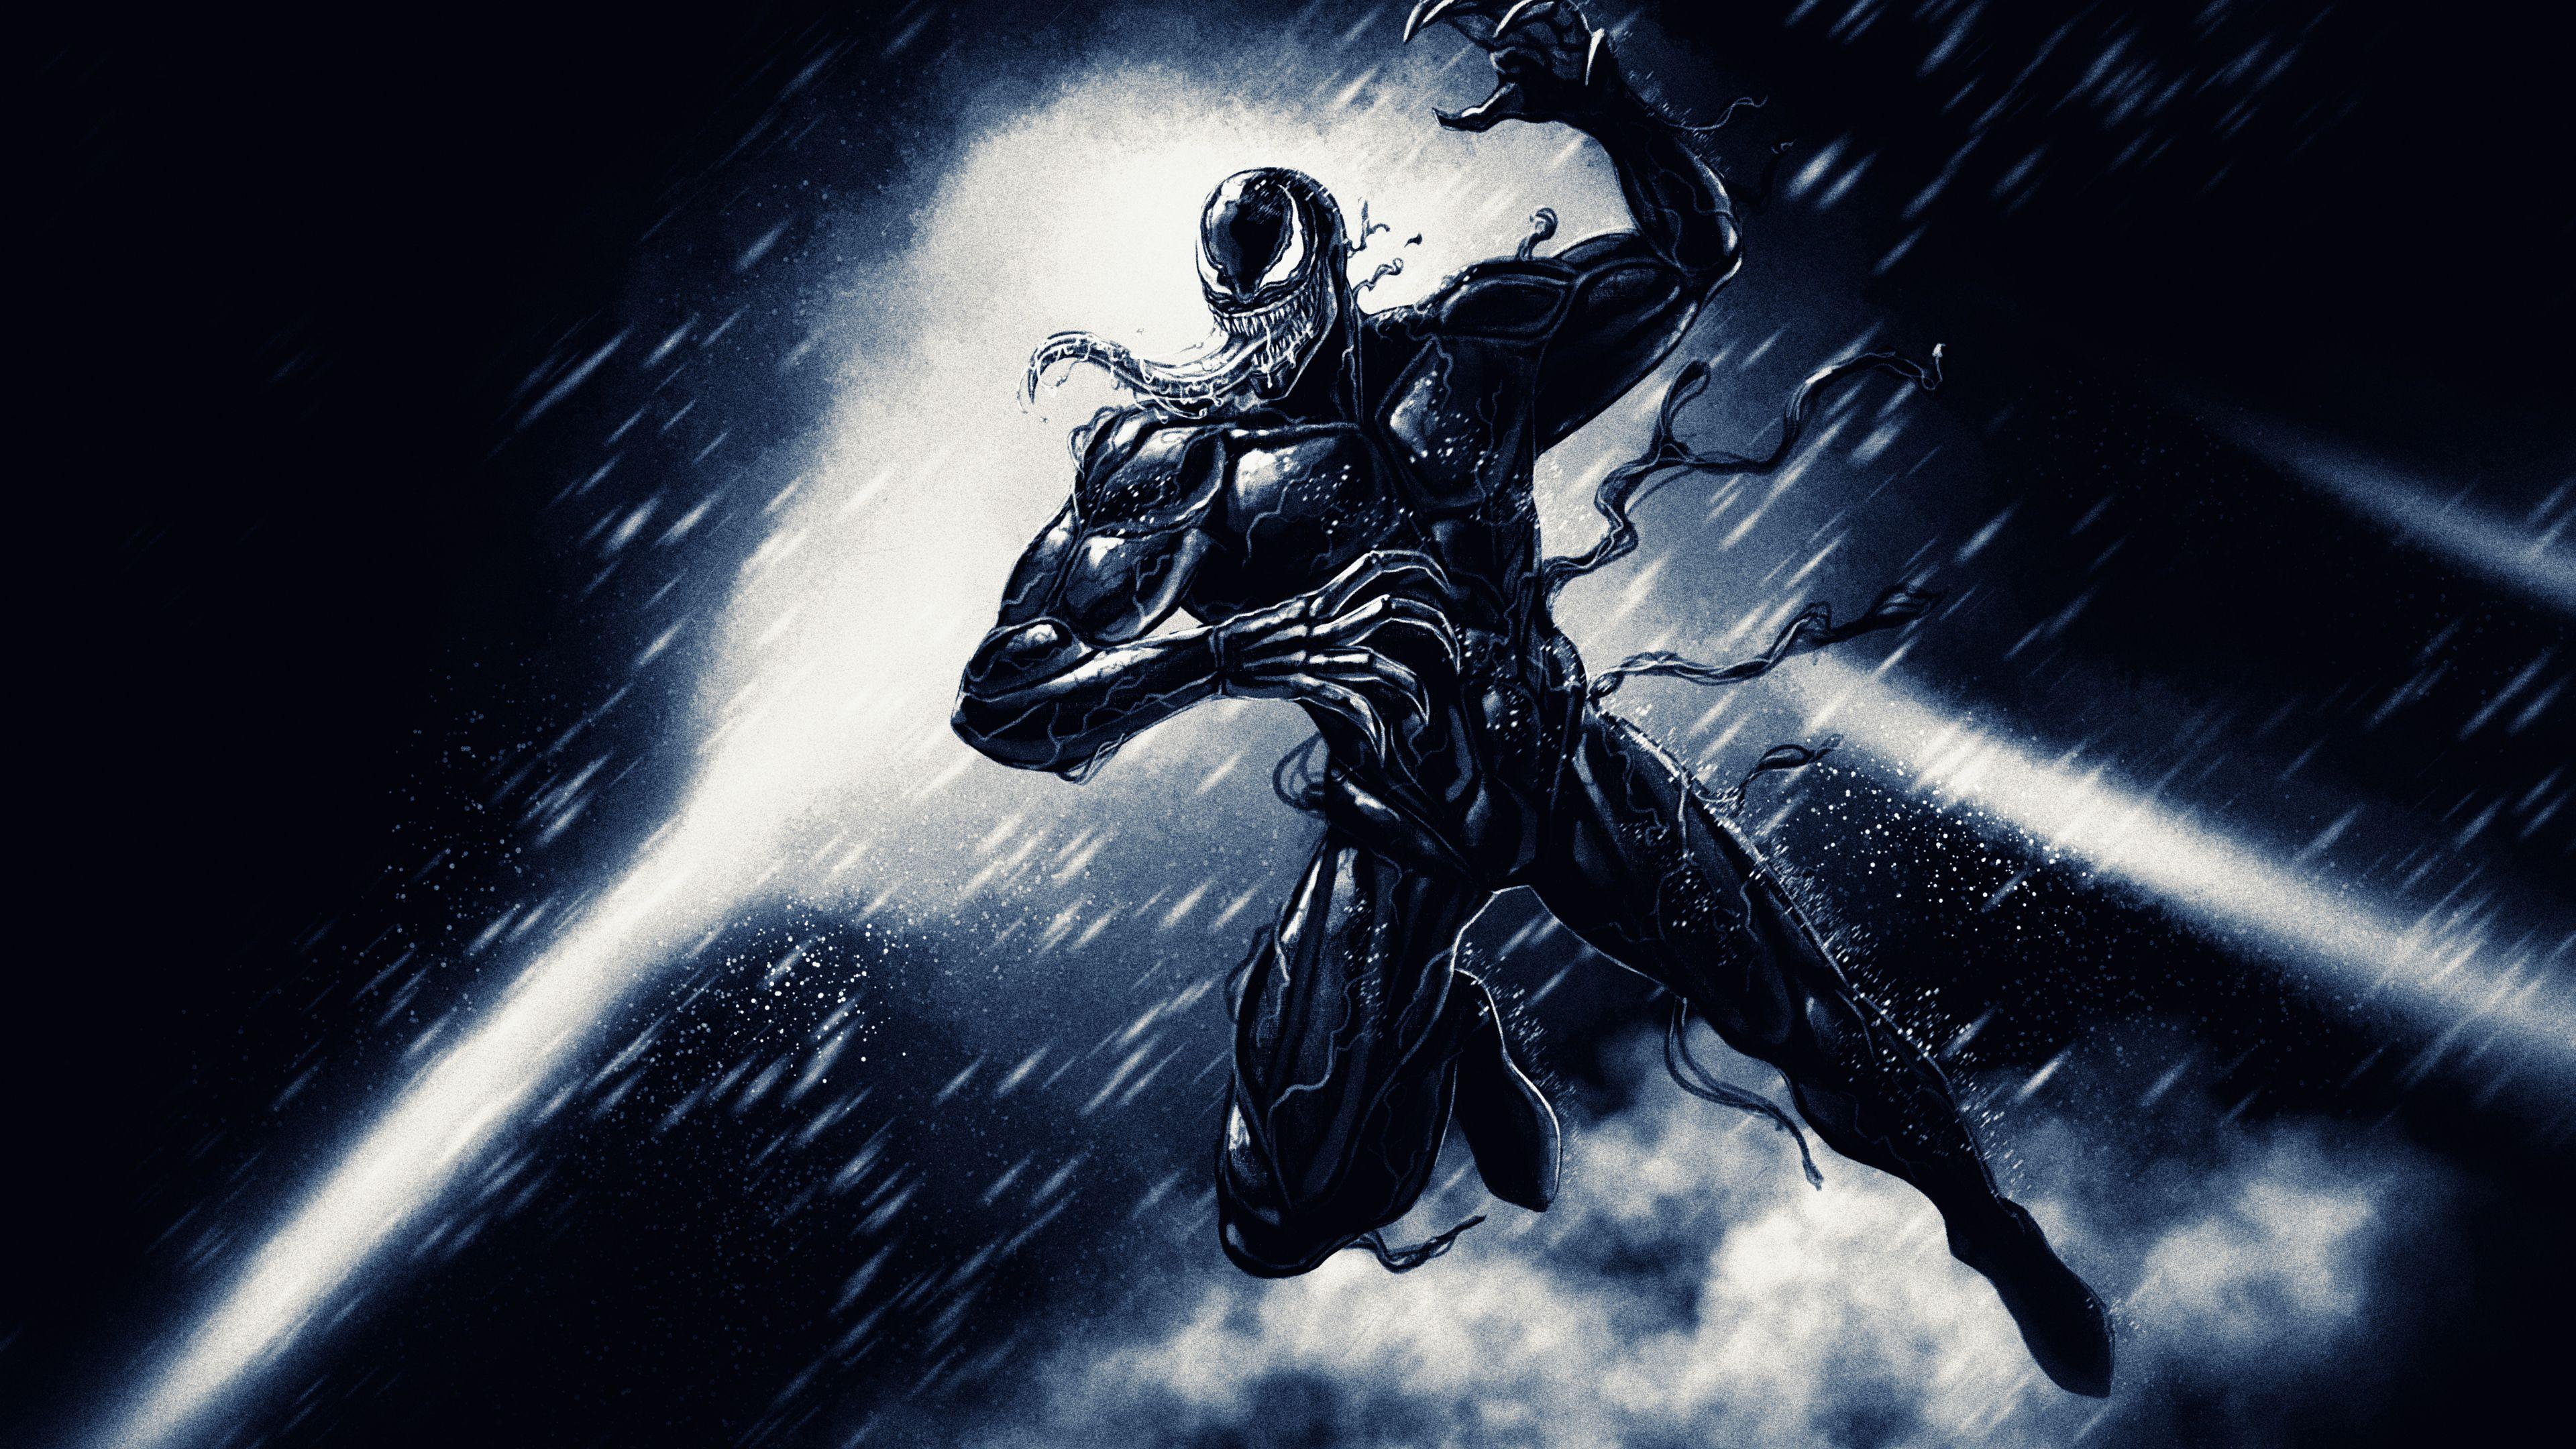 Venom 4k Artworks Venom Wallpapers Supervillain Wallpapers Superheroes Wallpapers Hd Wallpapers Digital Art Wallpapers Deviant Superhero Art Wallpaper Art